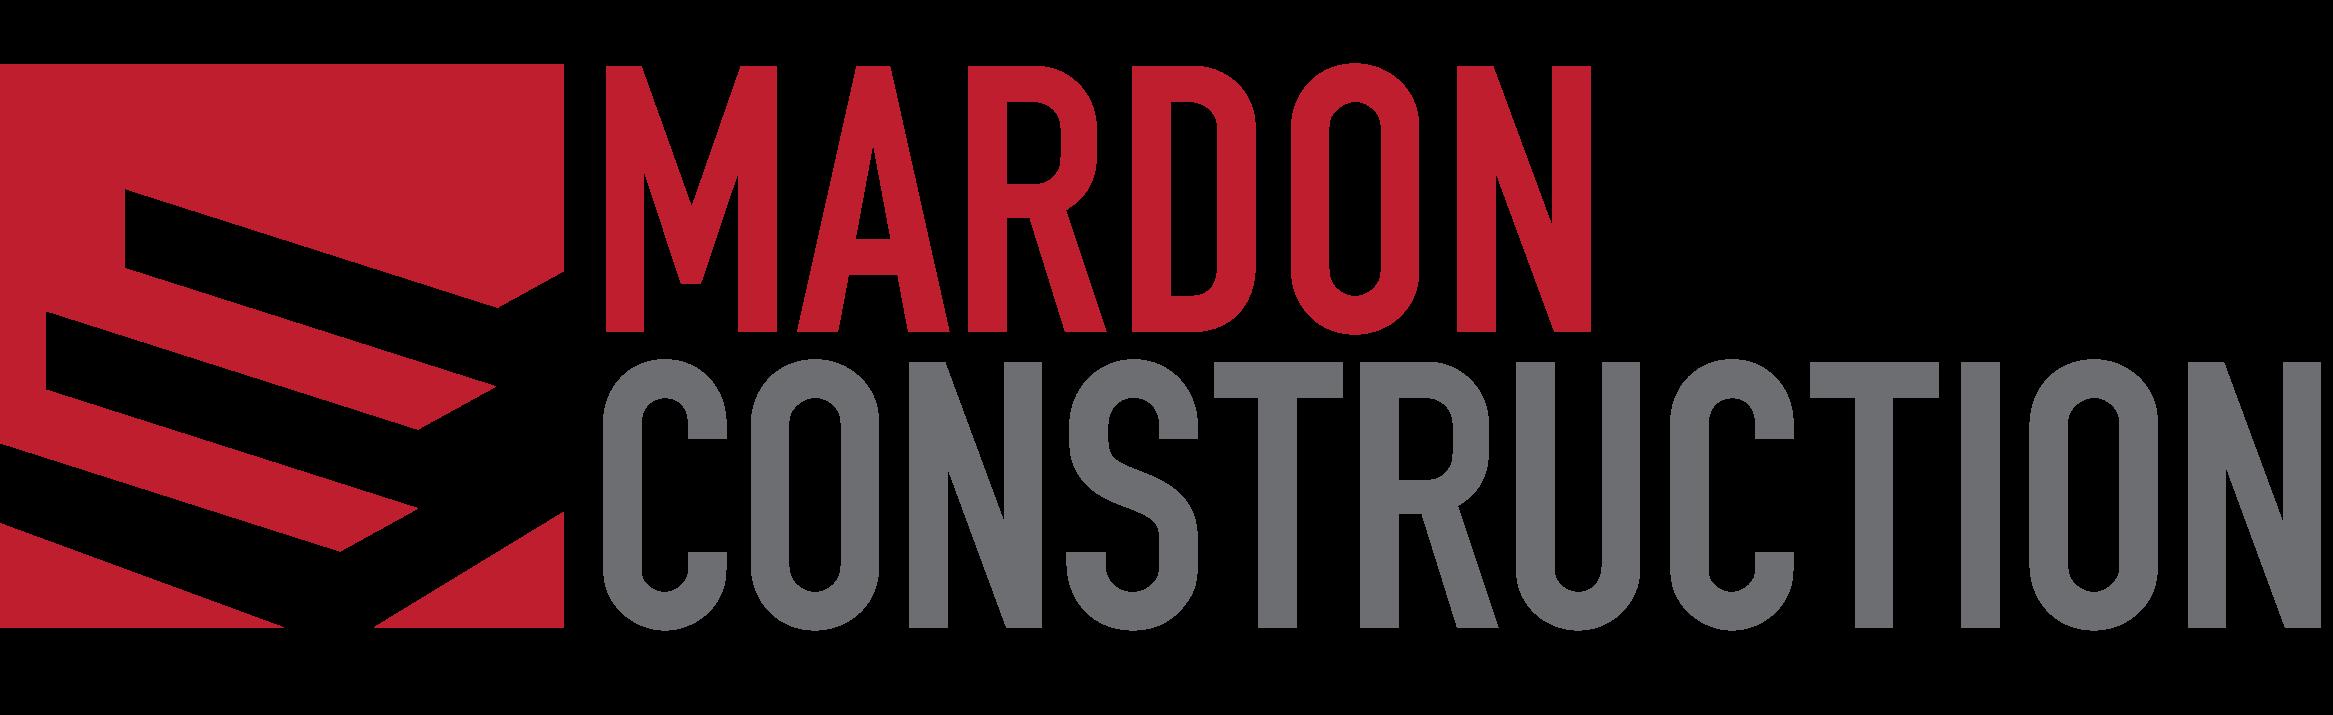 Mardon_logo_CMYK.png